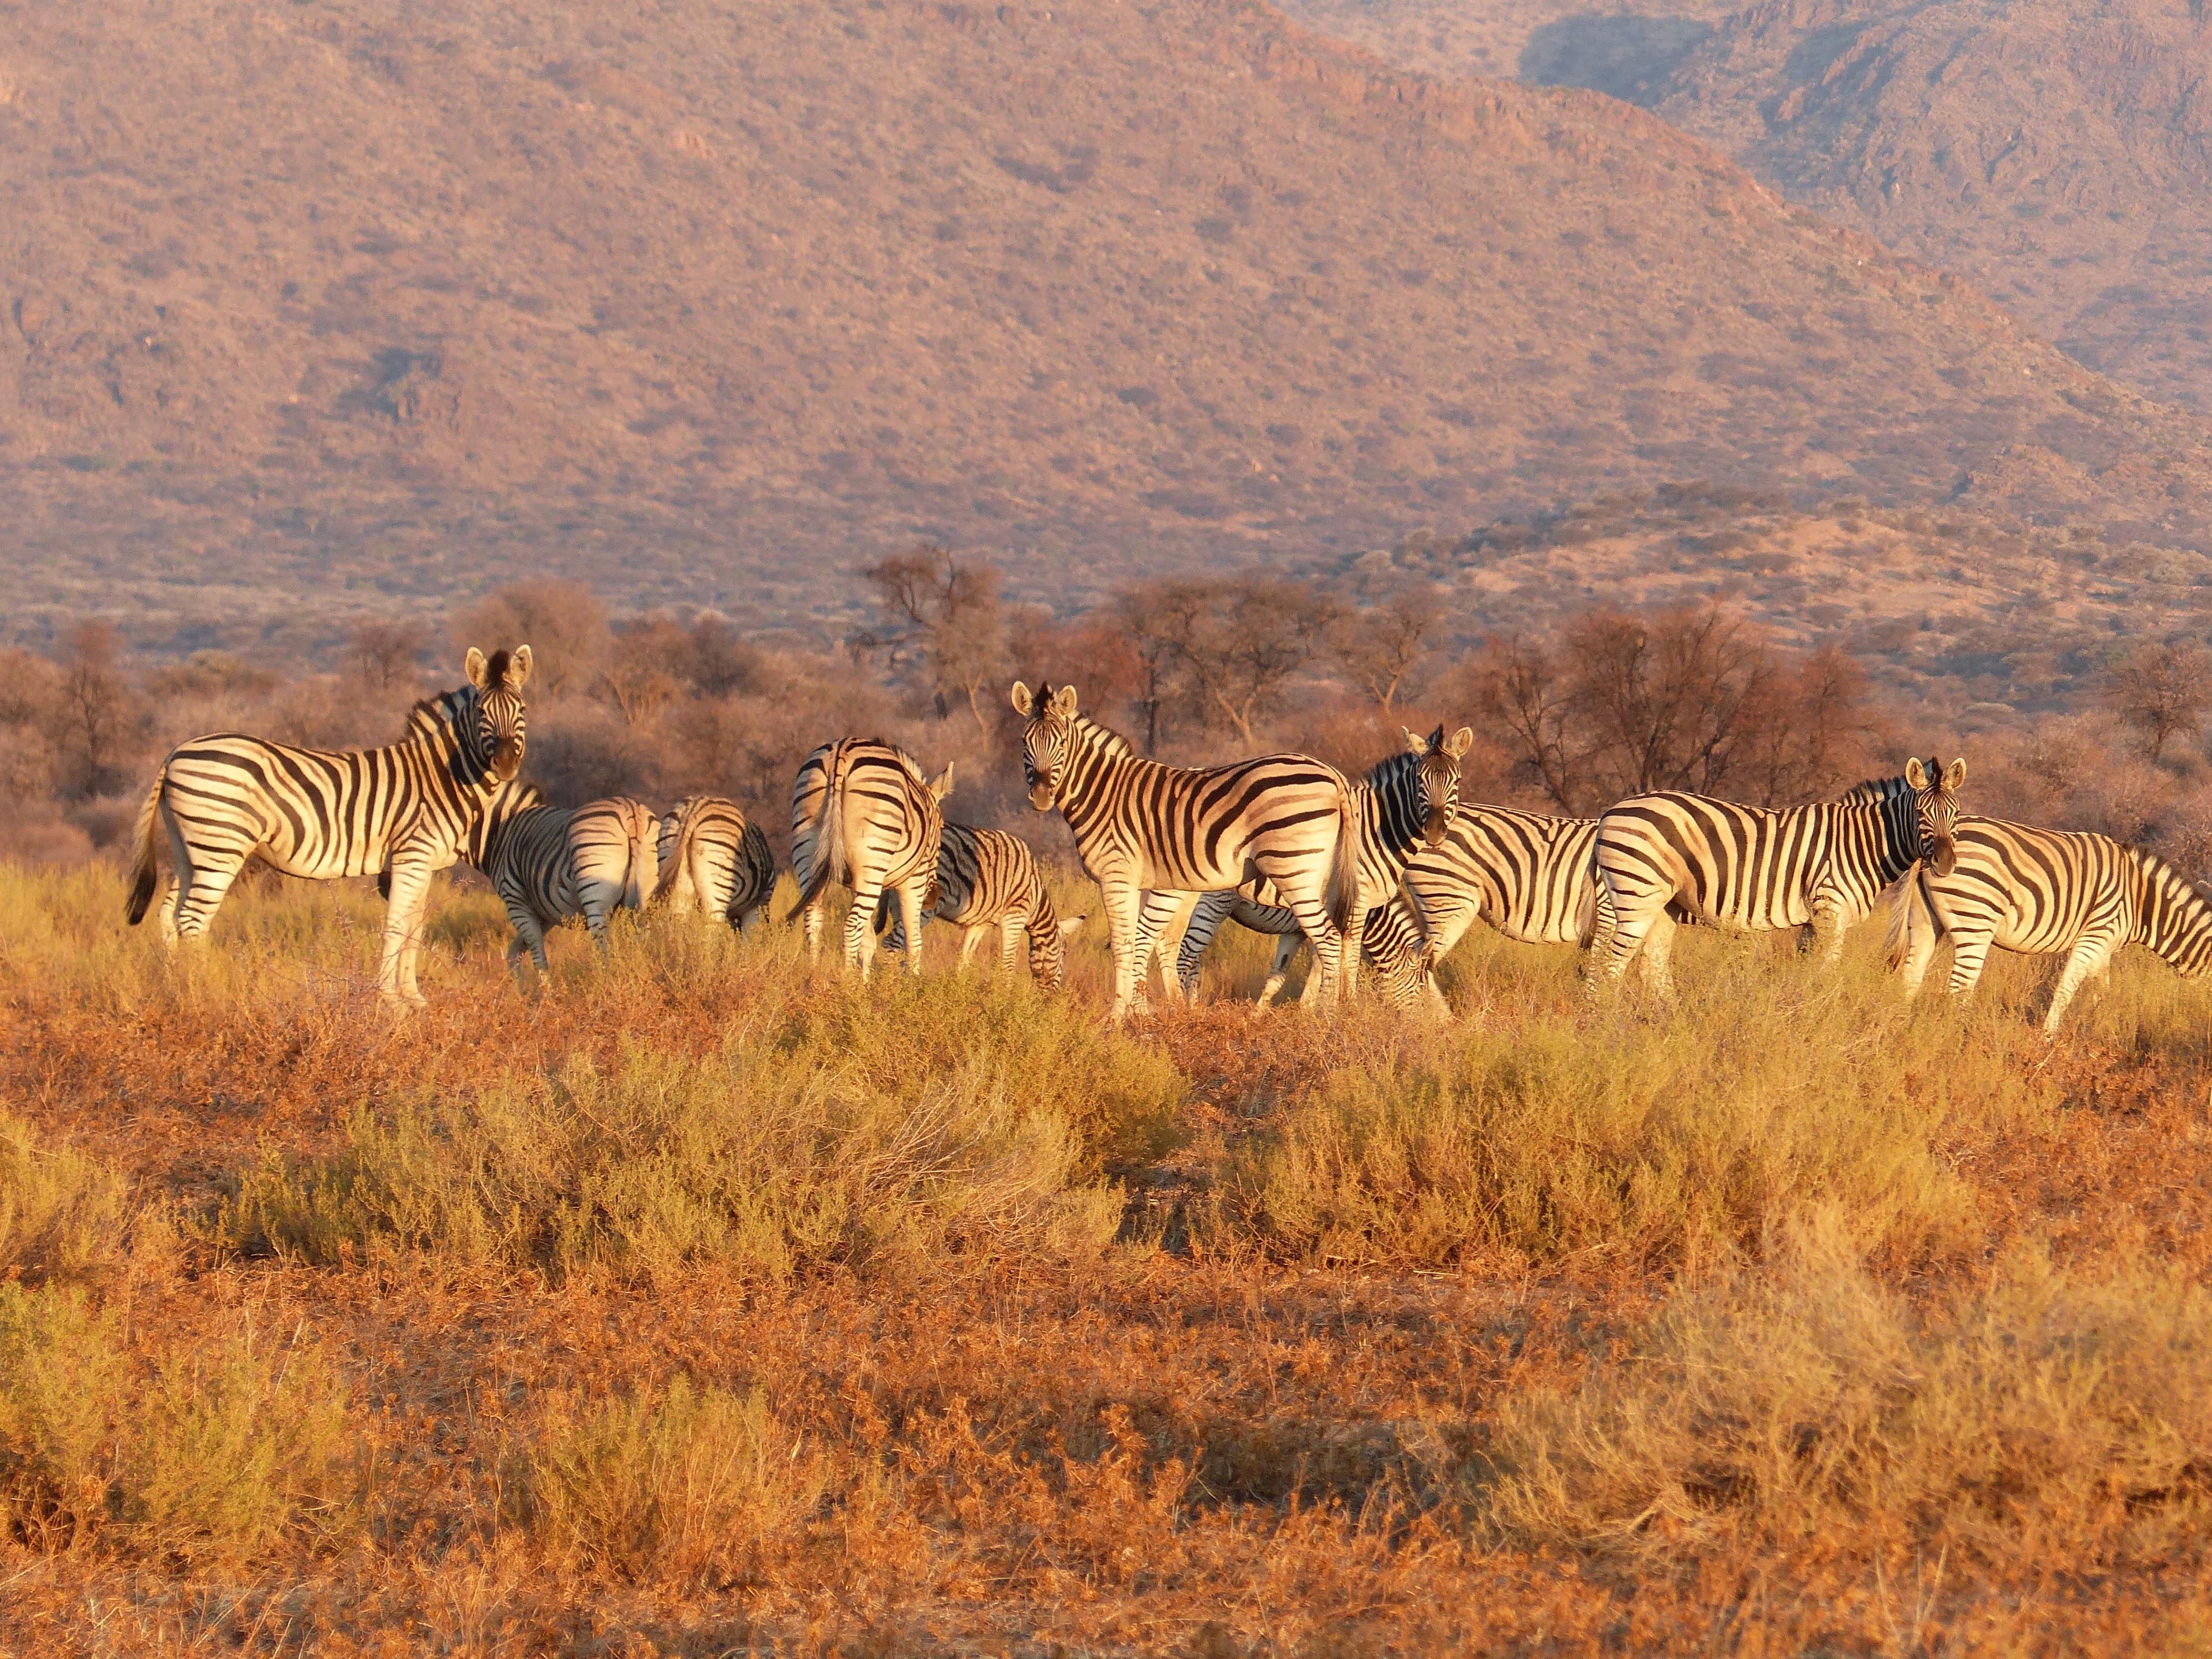 121159 download wallpaper Animals, Zebra, Herd, Savanna, Pasture screensavers and pictures for free